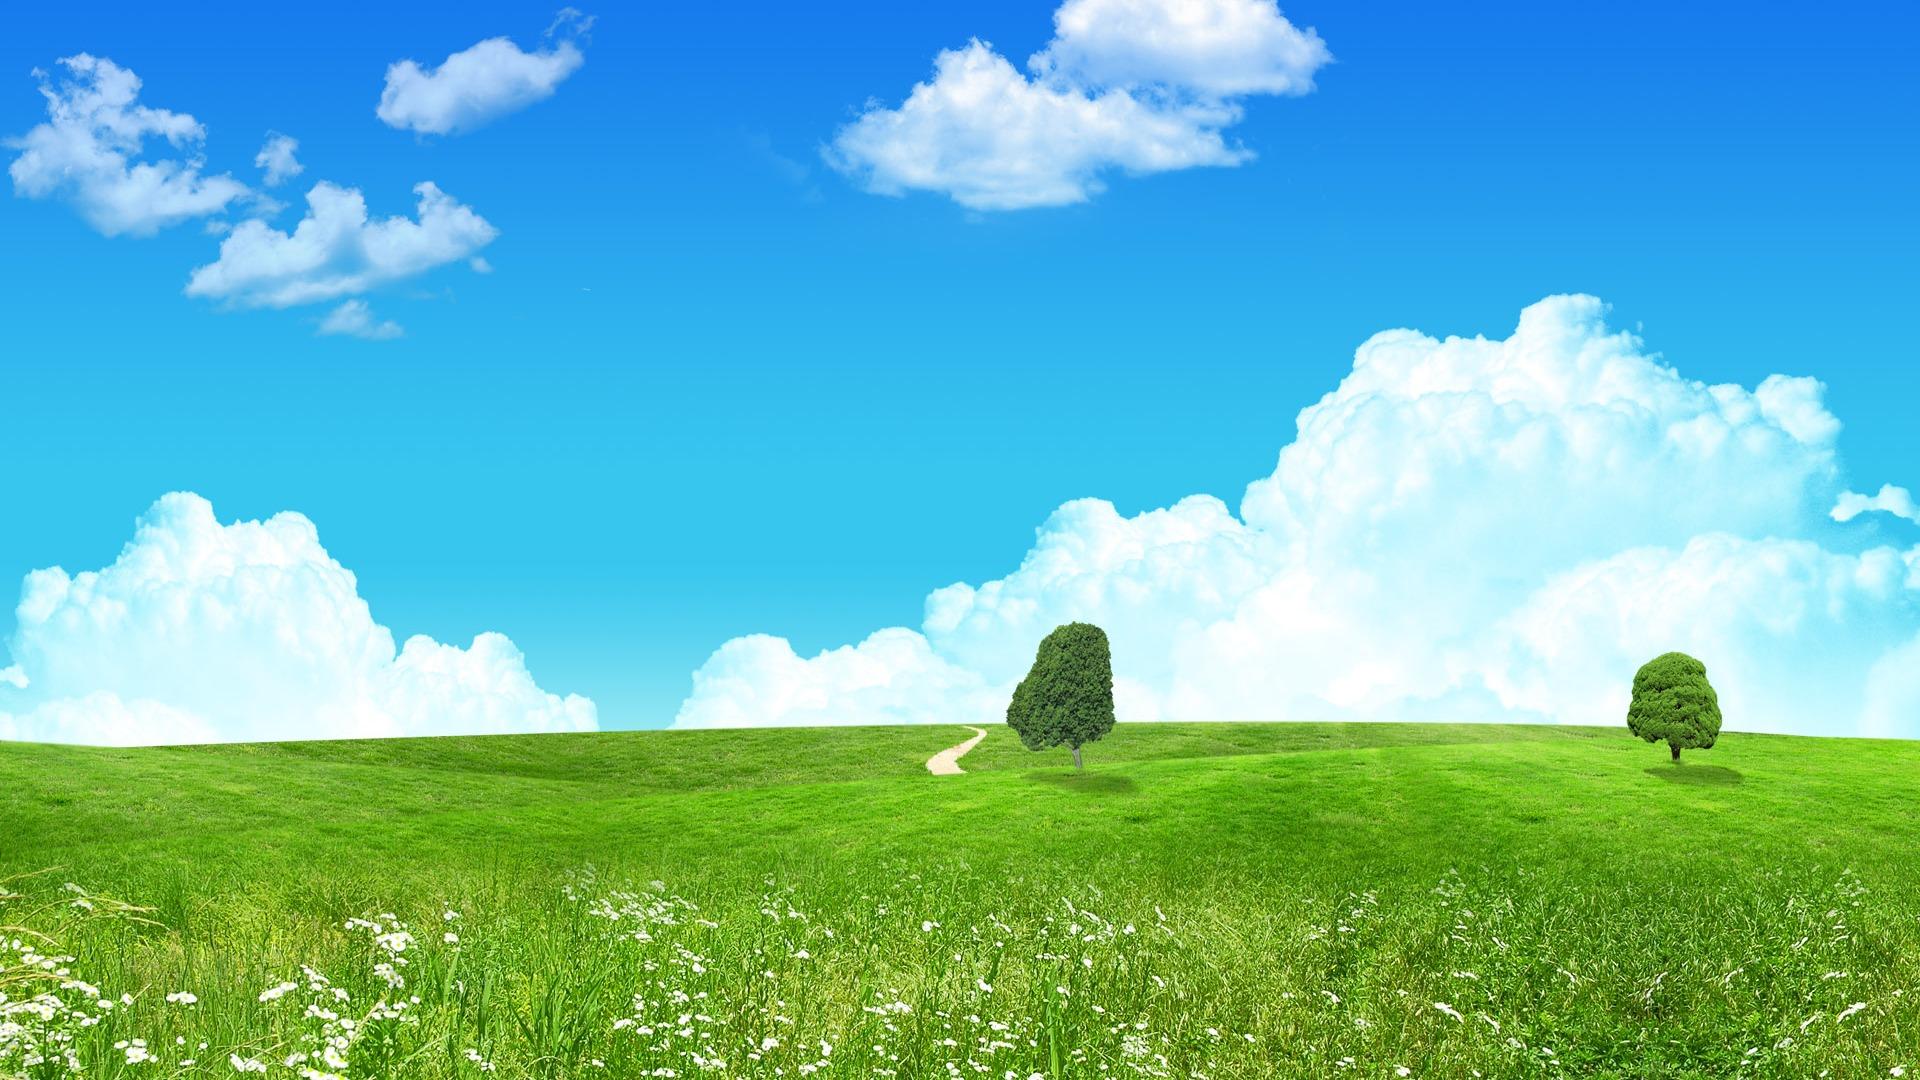 Photoshopの日当たりの良い夏の風景の壁紙 2 10 1920x1080 壁紙ダウンロード